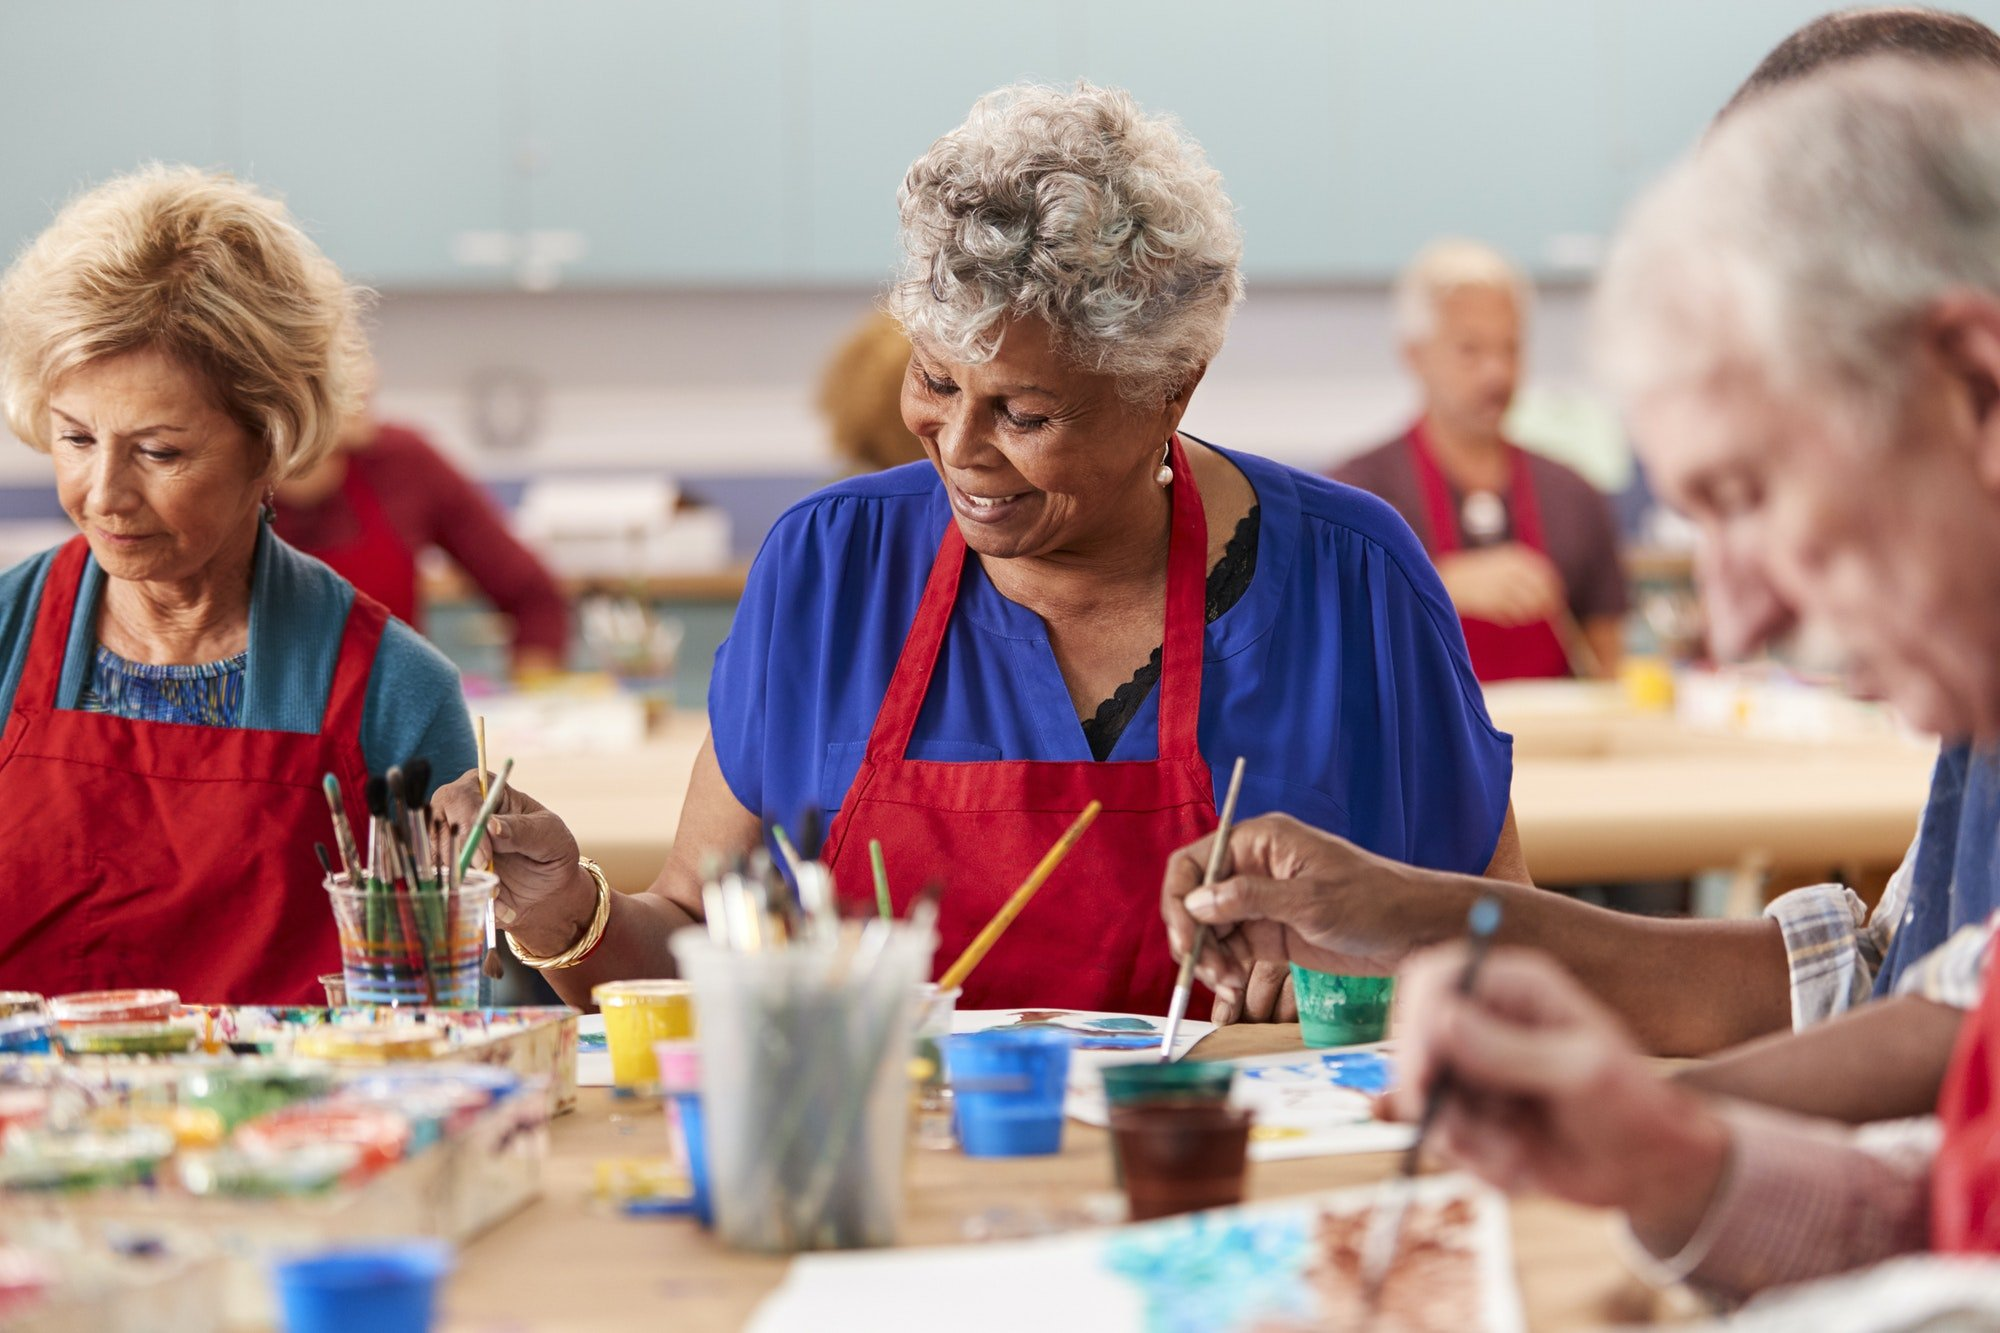 Retired Senior Woman Attending Art Class In Community Centre